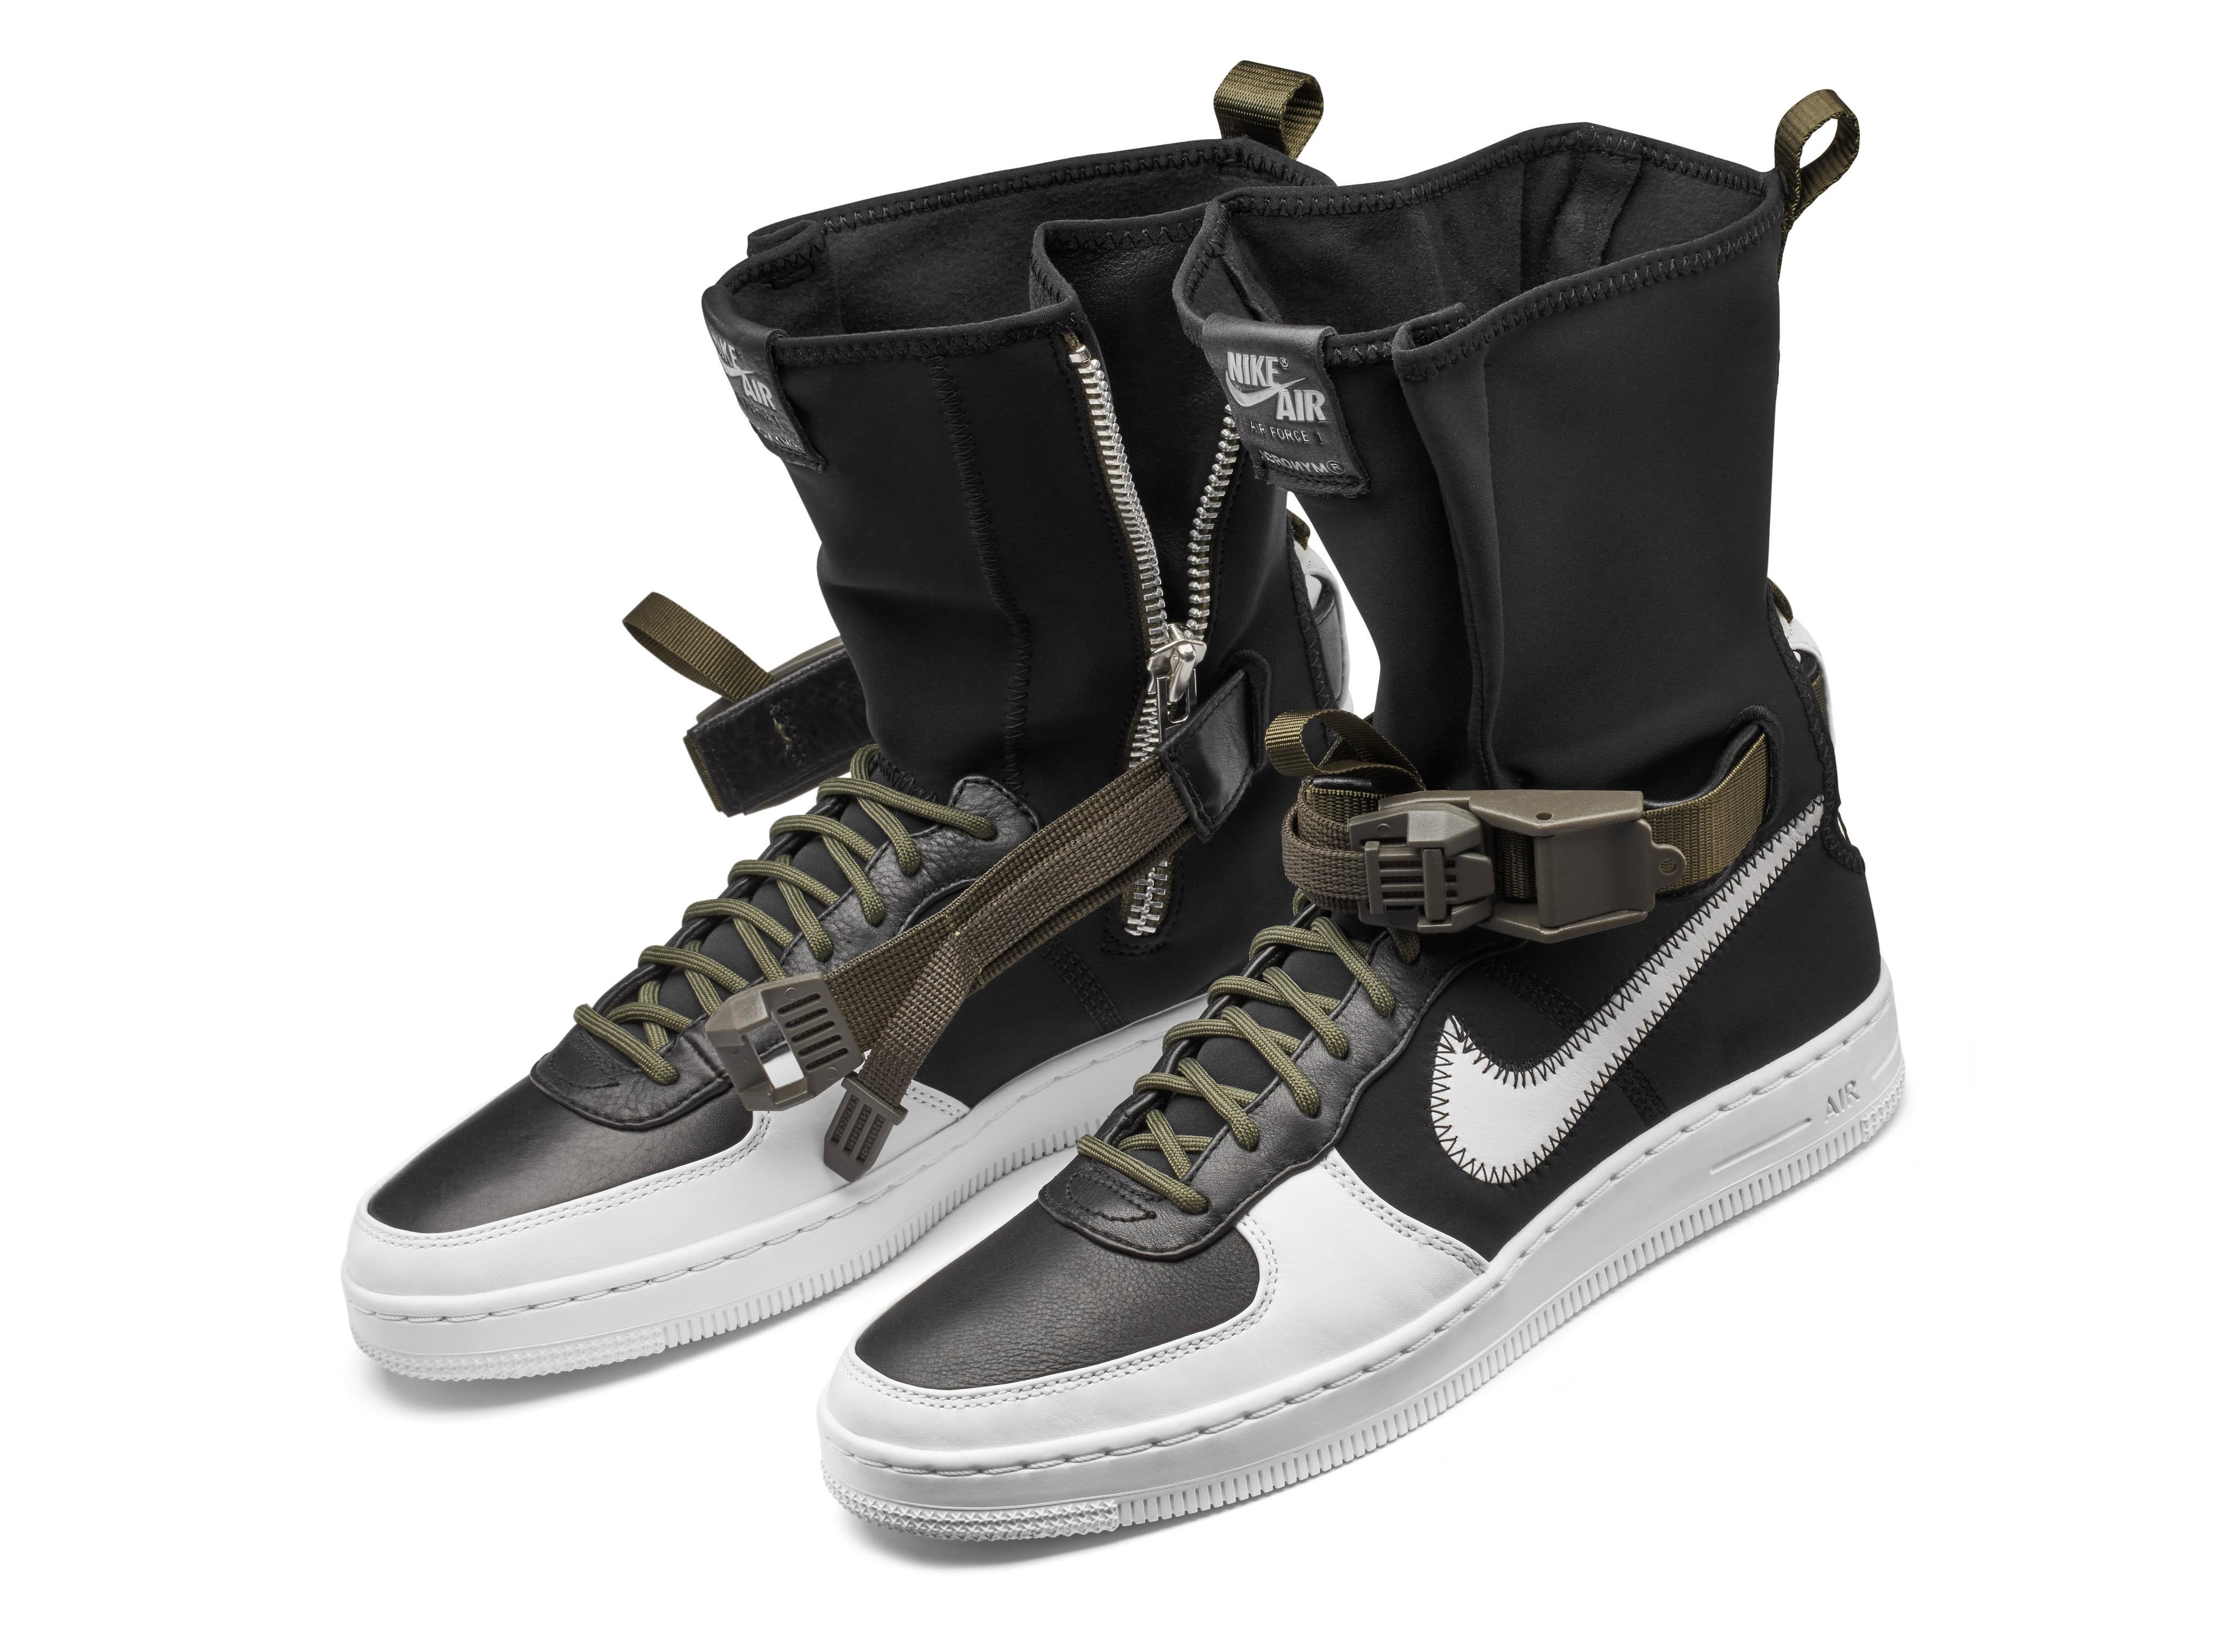 on sale b66d5 d8444 NikeLab Air Force 1 Acronym White Black